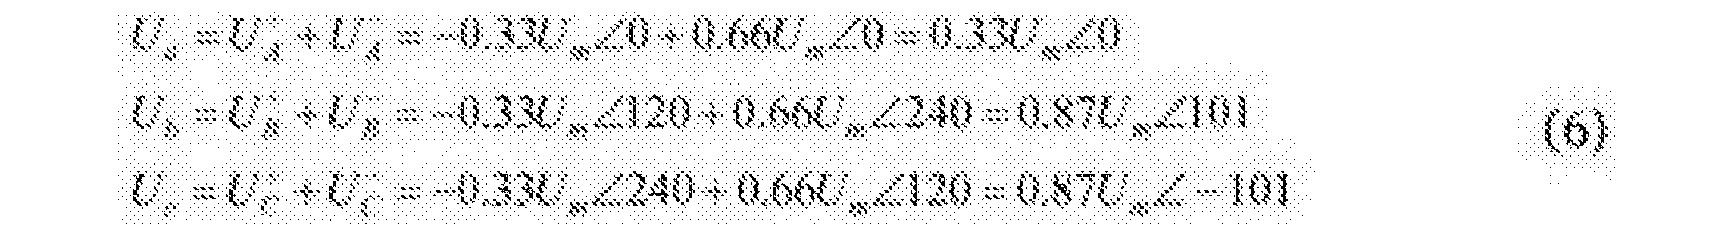 Figure CN107078656AD00104